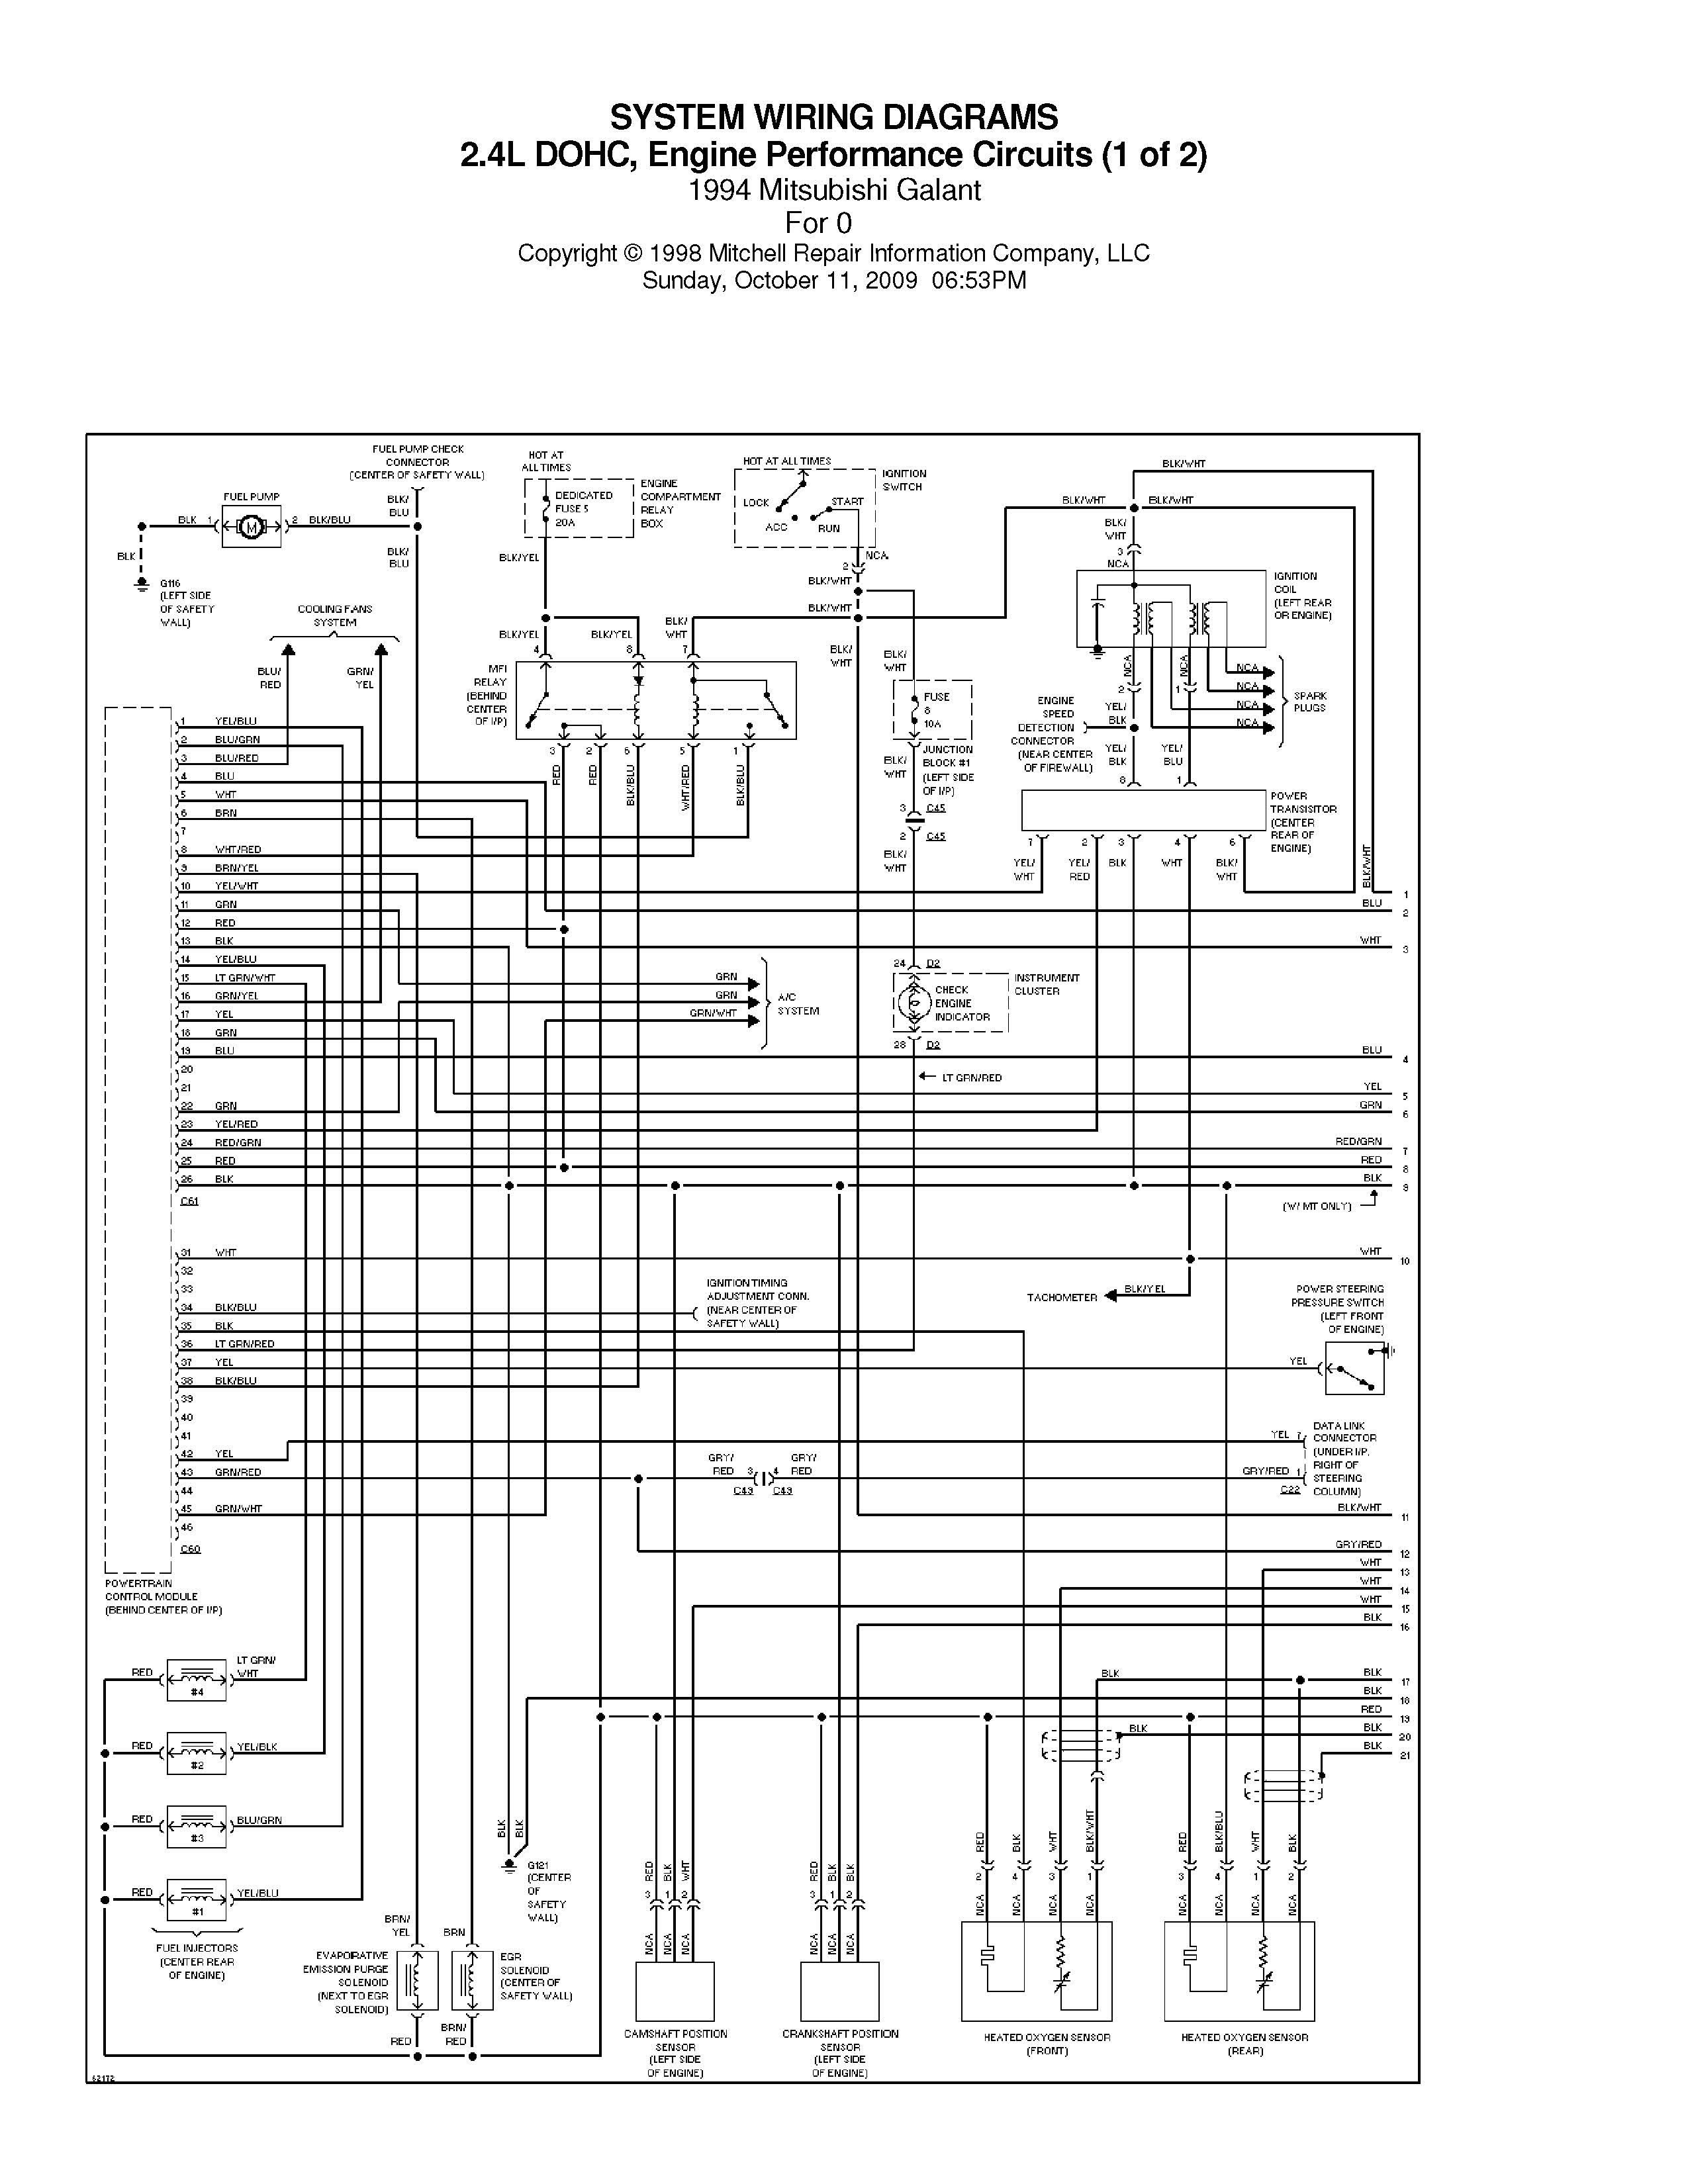 2000 Mitsubishi Galant Engine Diagram Wiring Diagram 2011 Galant Schematic 2000 Mitsubishi Beauteous Afif Of 2000 Mitsubishi Galant Engine Diagram